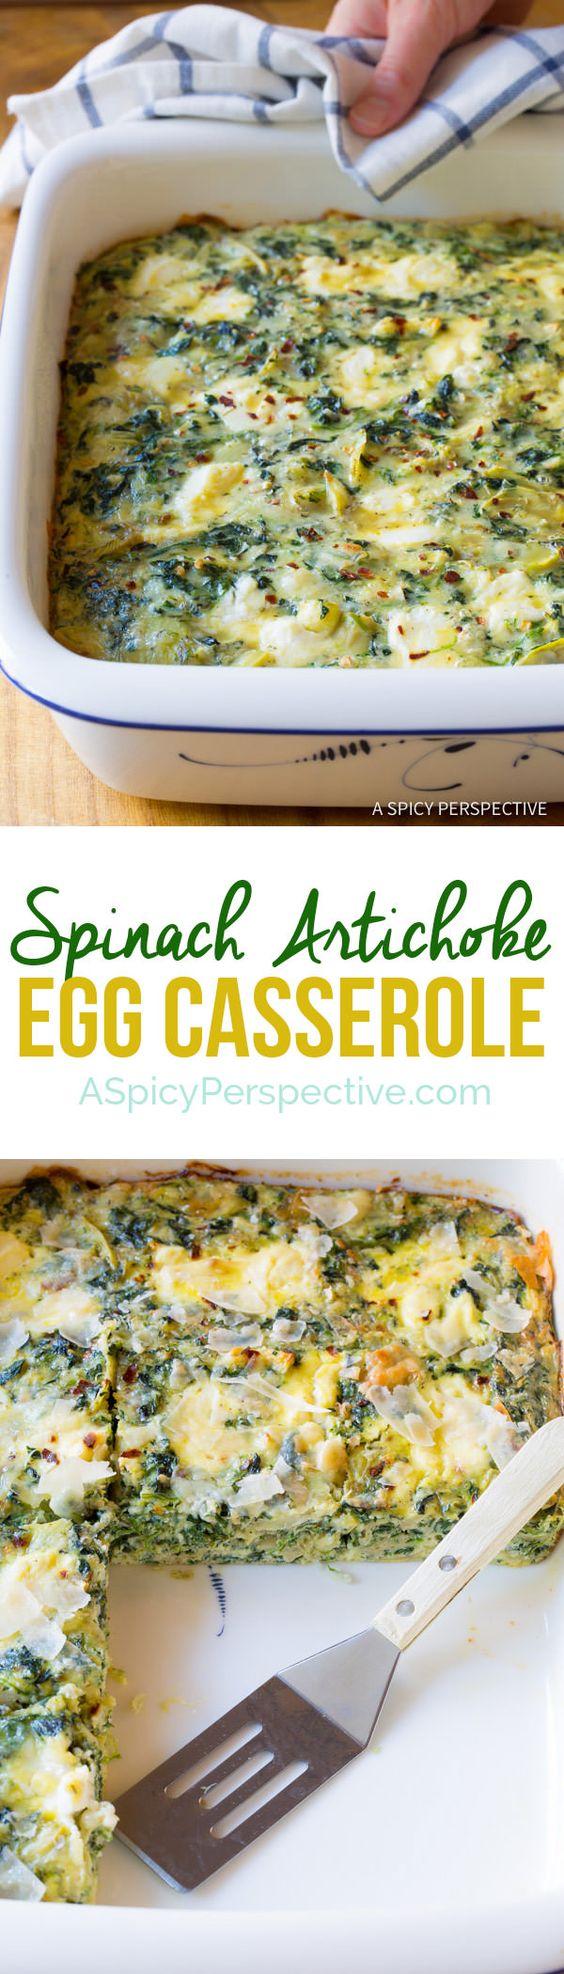 Savory Spinach Artichoke Egg Casserole (Low Carb, Vegetarian & Gluten Free!) | ASpicyPerspective.com